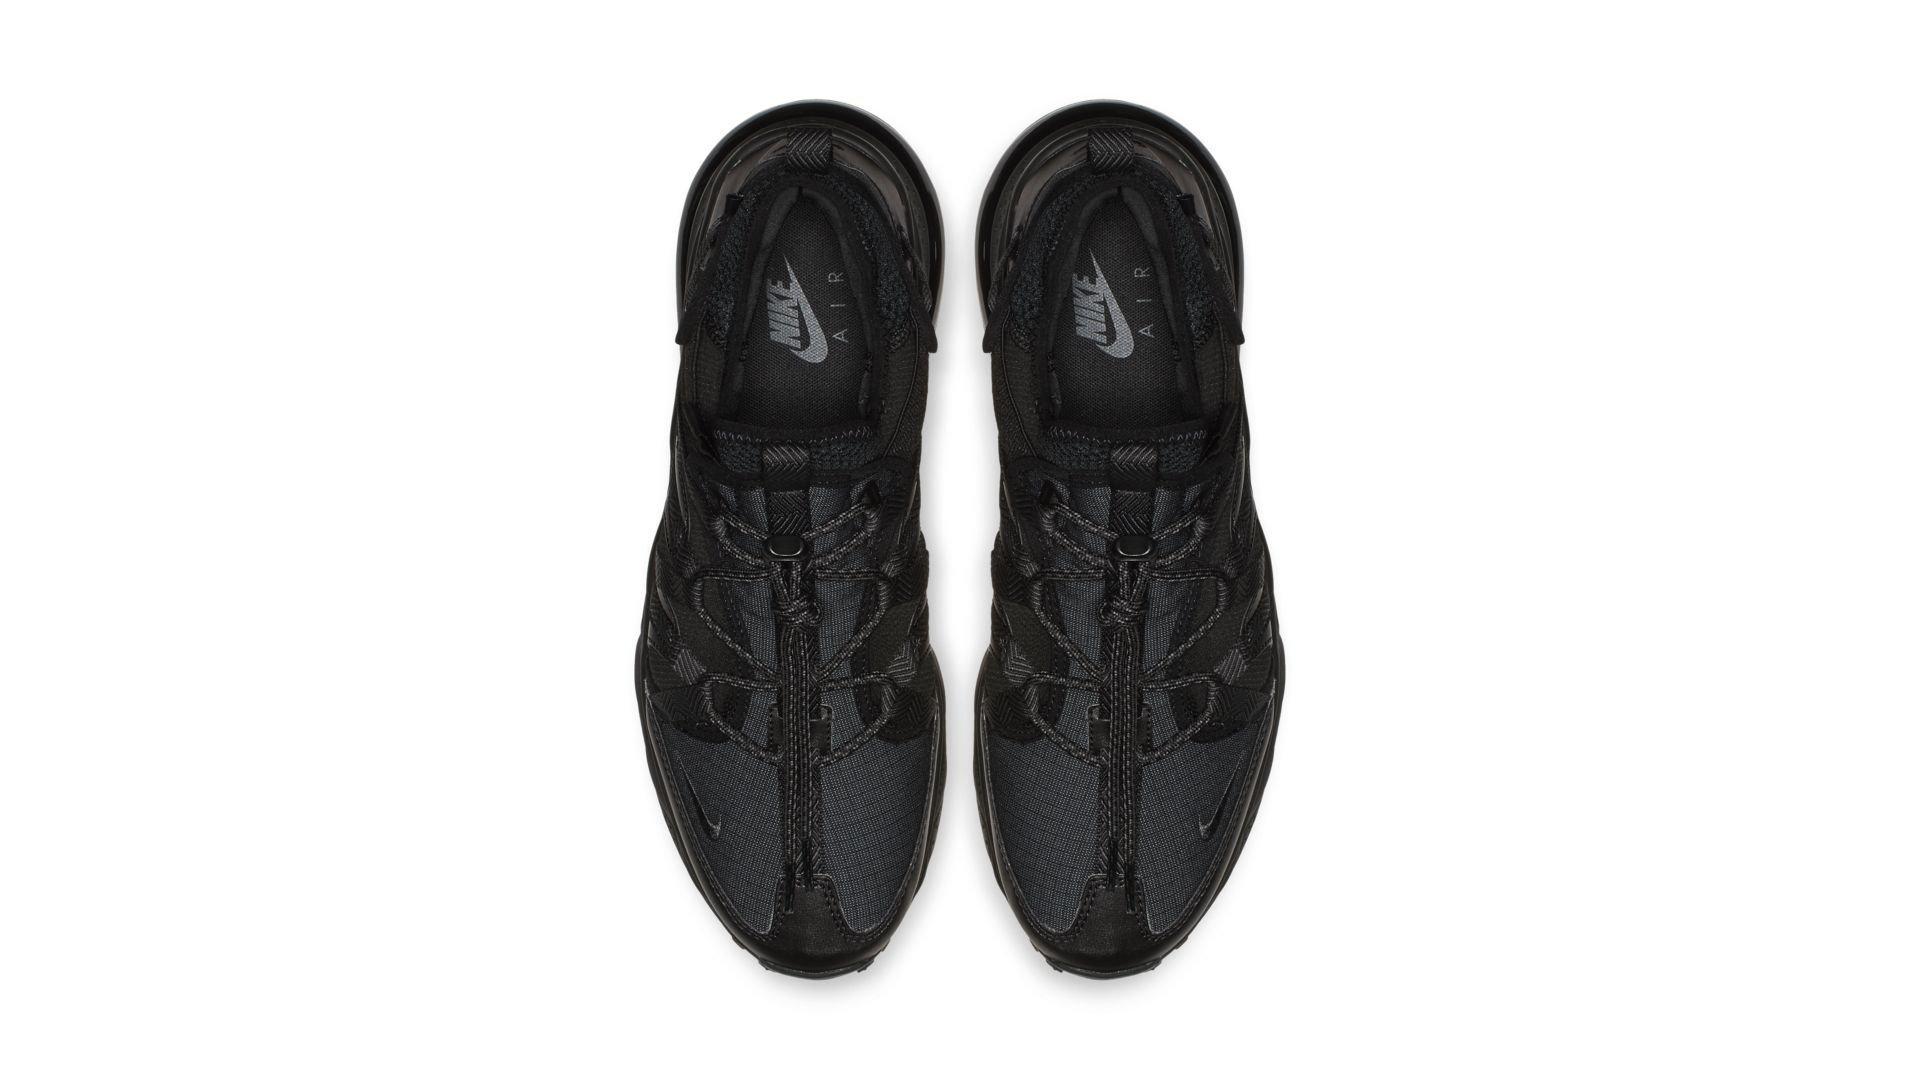 Nike Air Max 270 Bowfin BlackBlack AJ7200 005